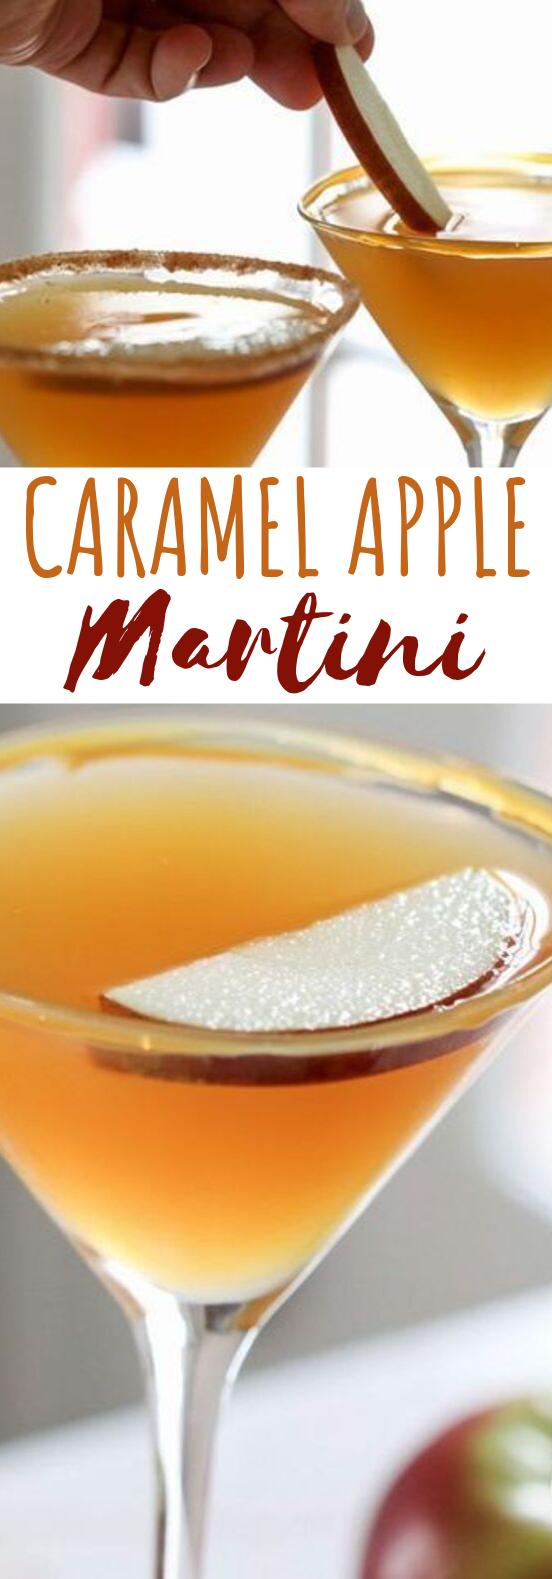 Caramel Apple Martini #drinks #cocktails